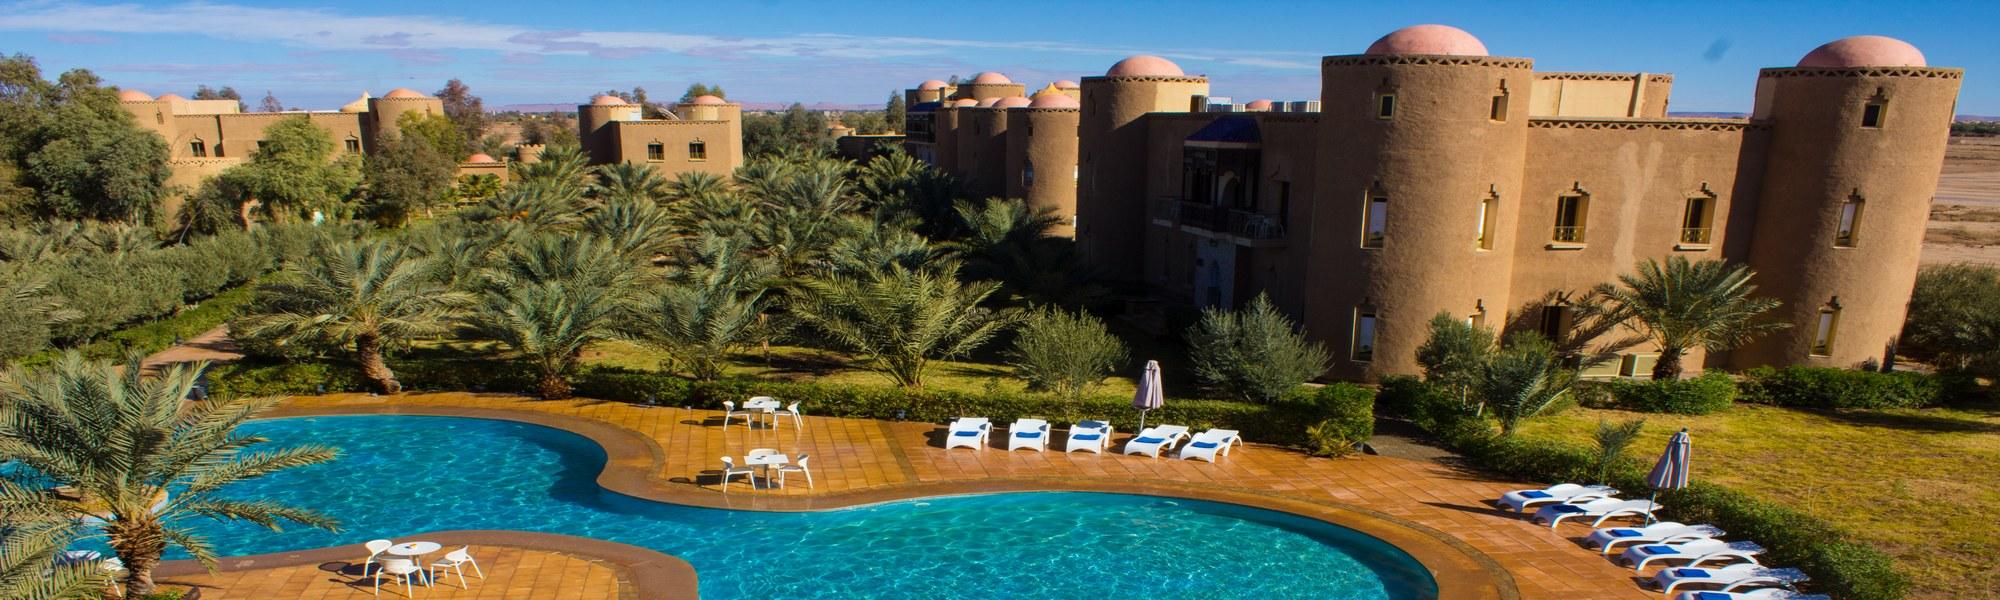 Resultado de imagen de palais du desert hotel & spa erfoud